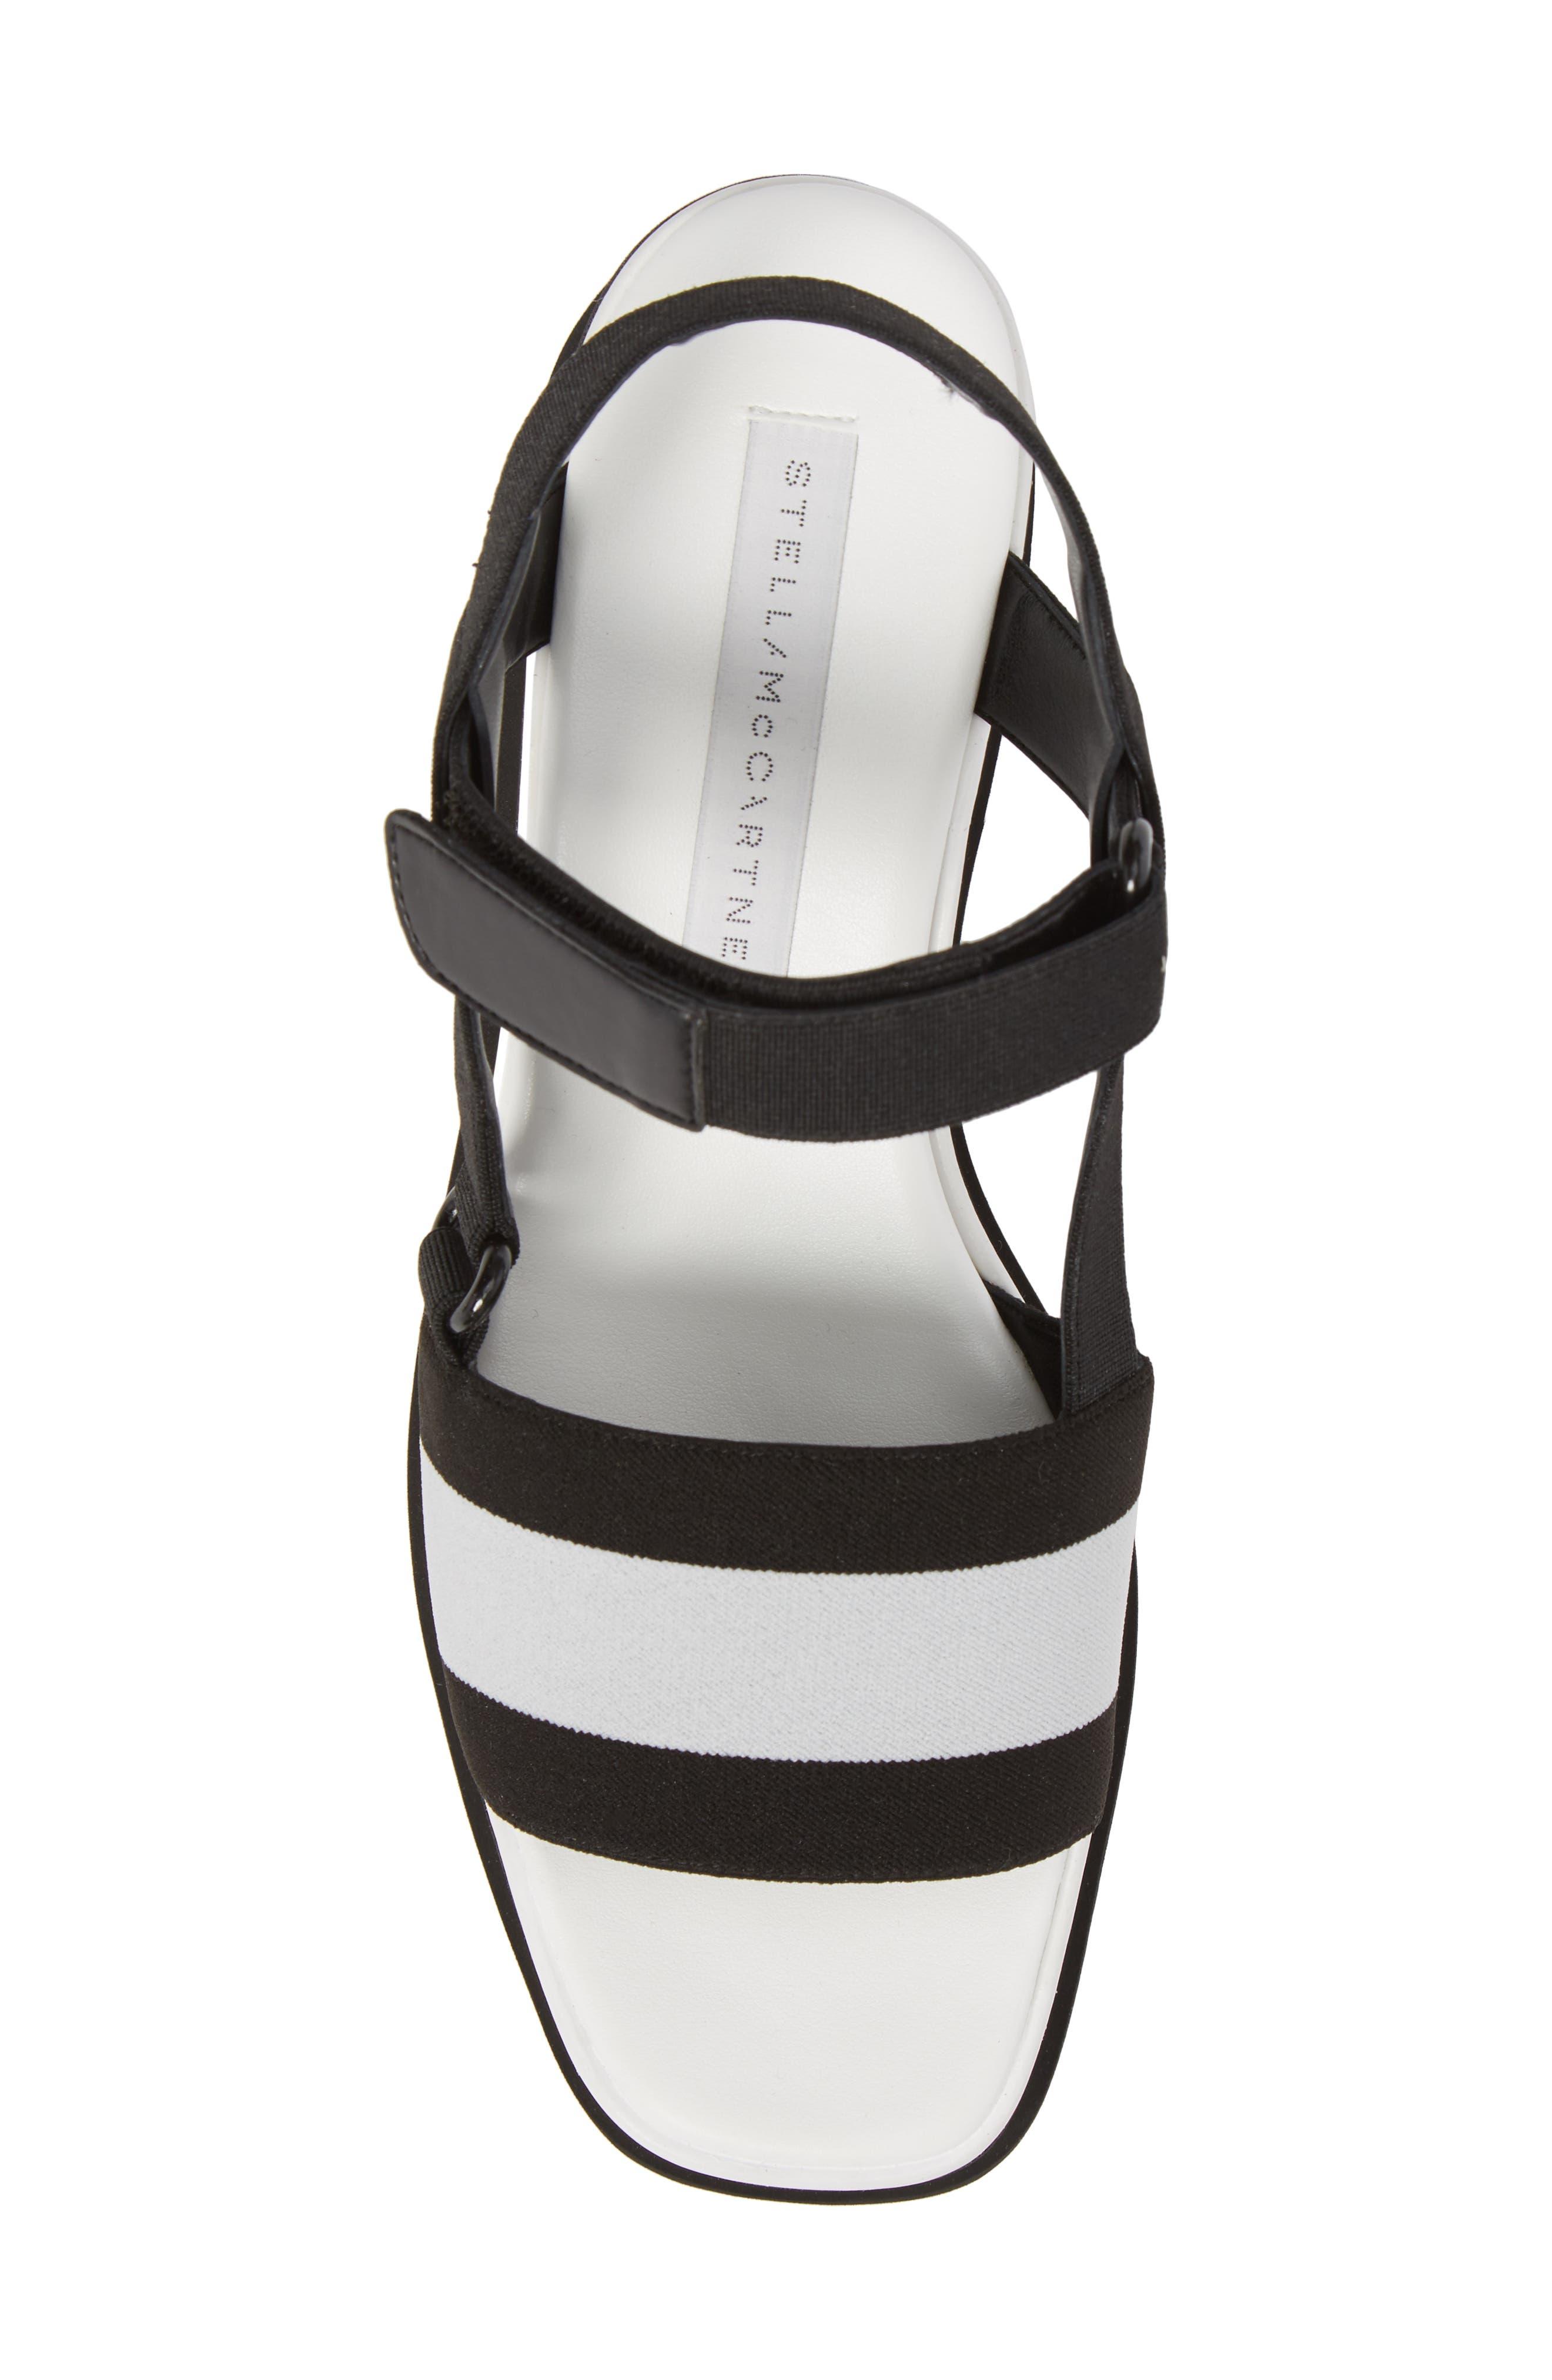 Stripe Platform Sandal,                             Alternate thumbnail 5, color,                             Black/ White